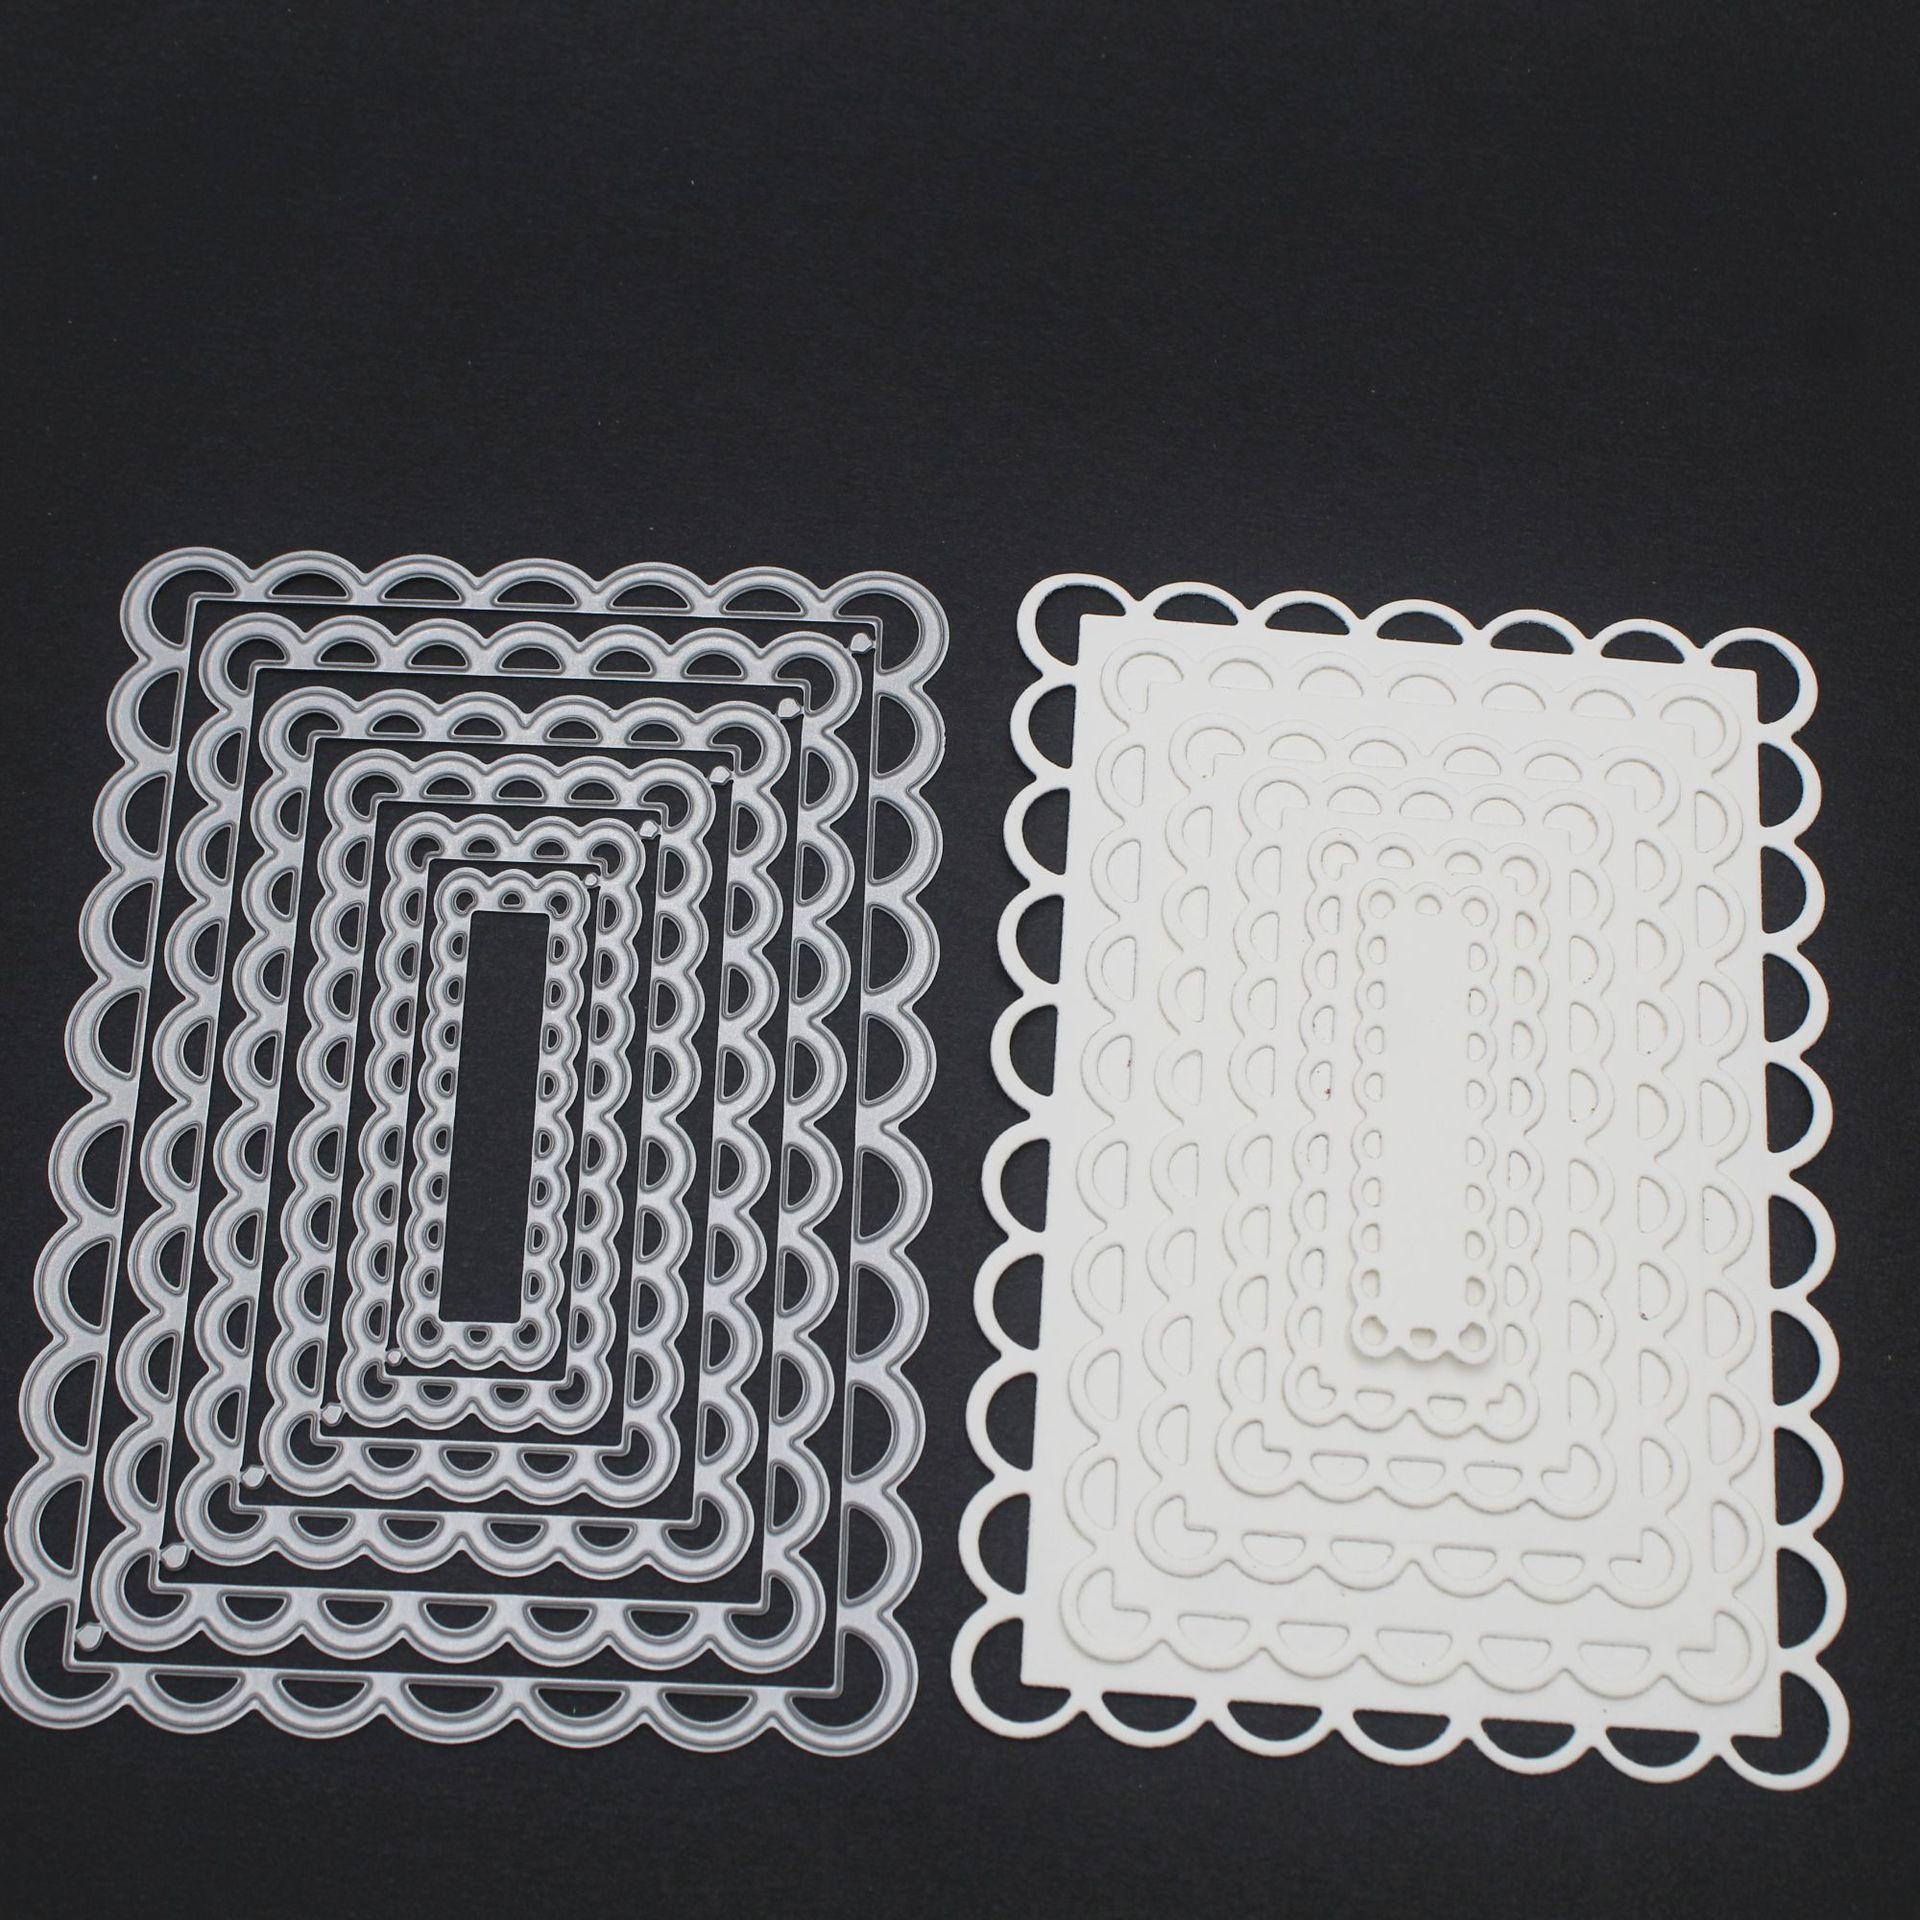 Flower Creative Background / Envelope Lace Invitation Cutting Stencils for DIY frame cutting craft dies 140*98